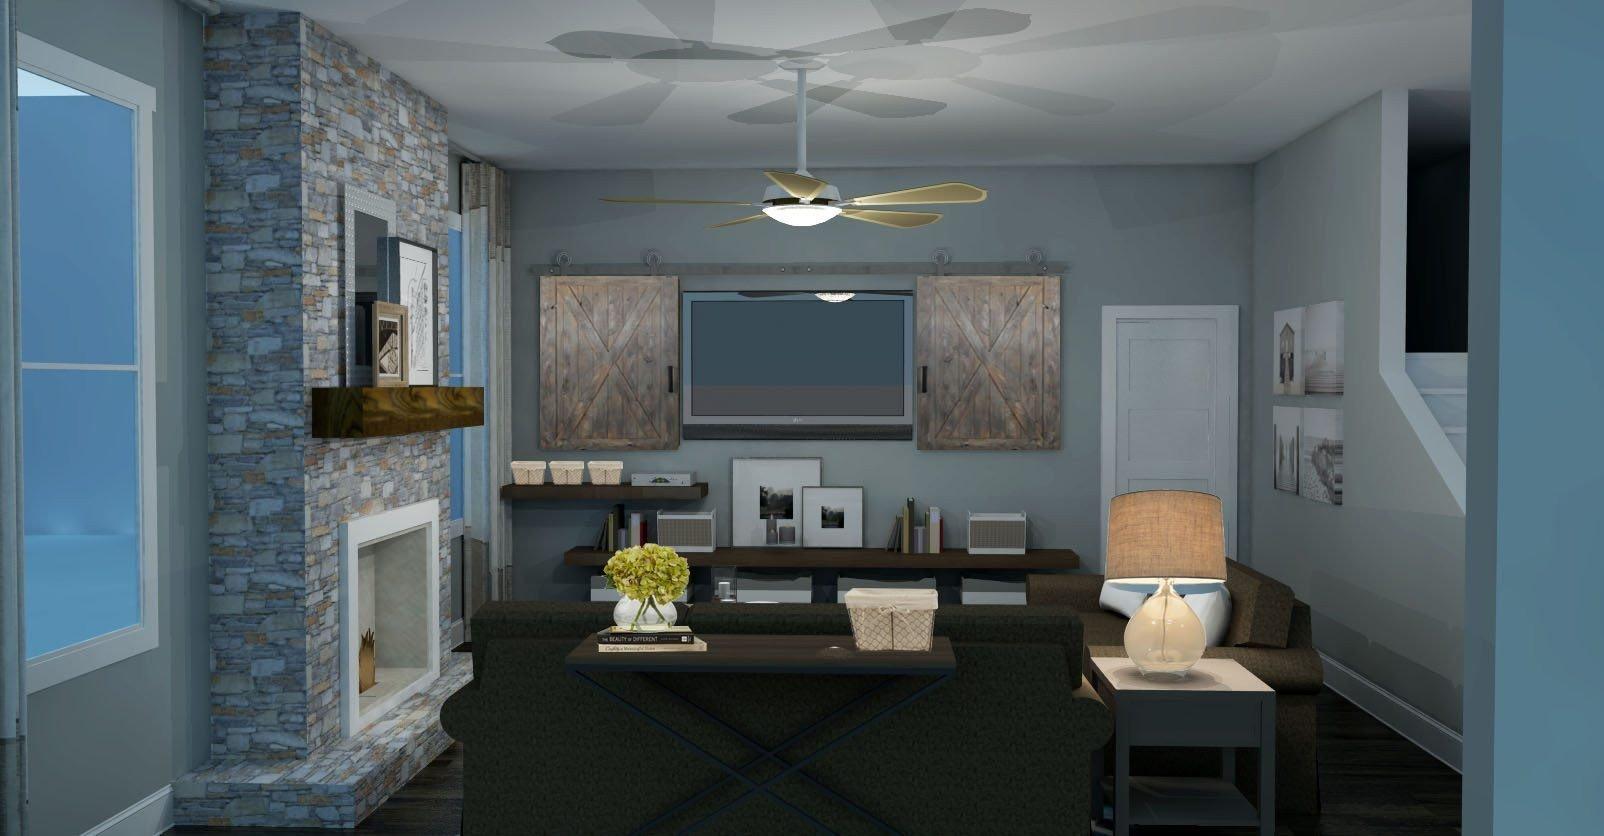 Modern Rustic Decor Living Room Awesome Modern Rustic Living Room Design